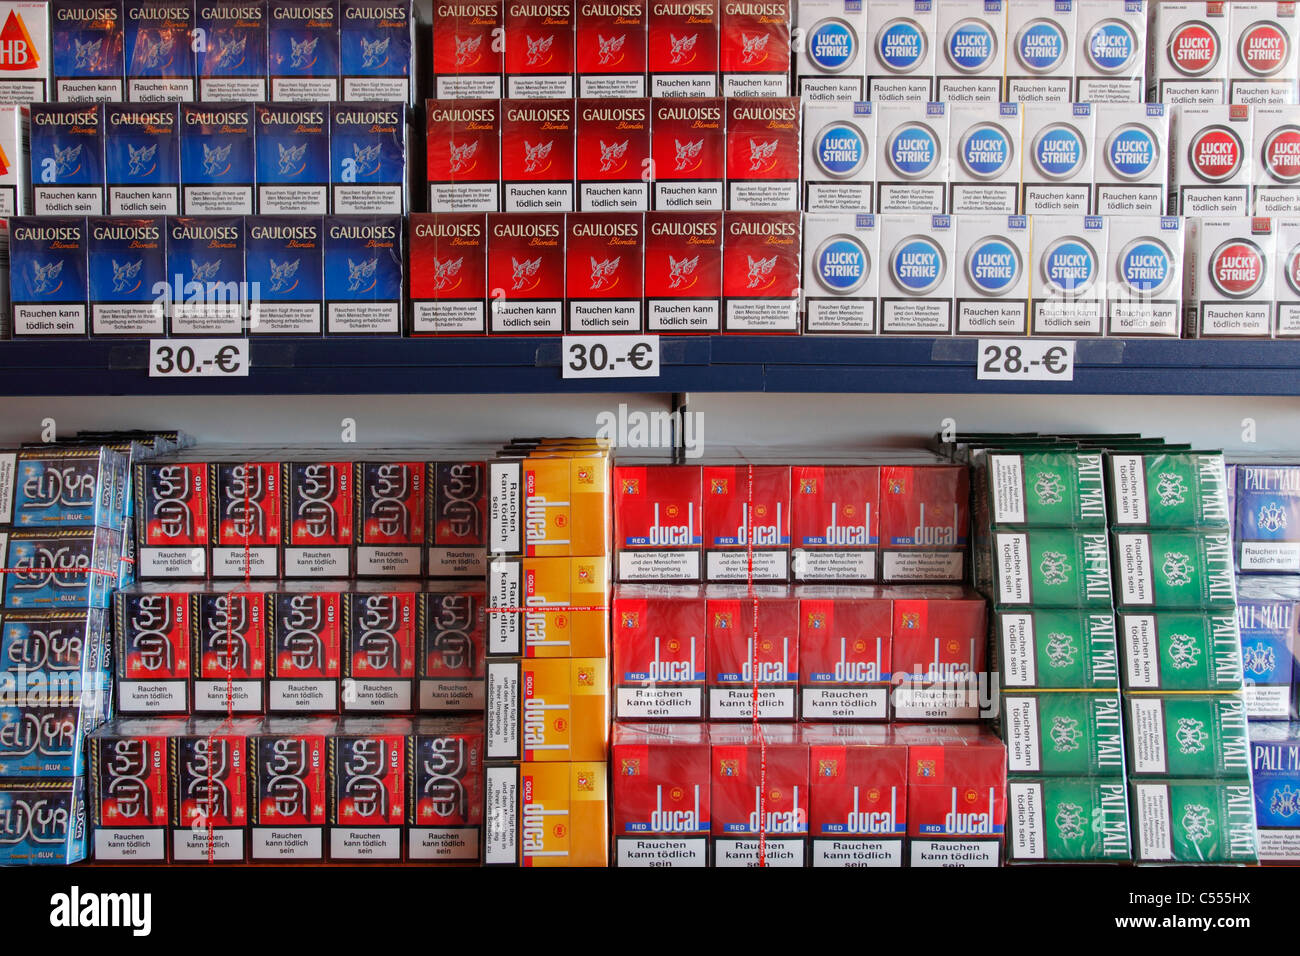 Buy cigars duty free shop davidoff cigarettes price canada